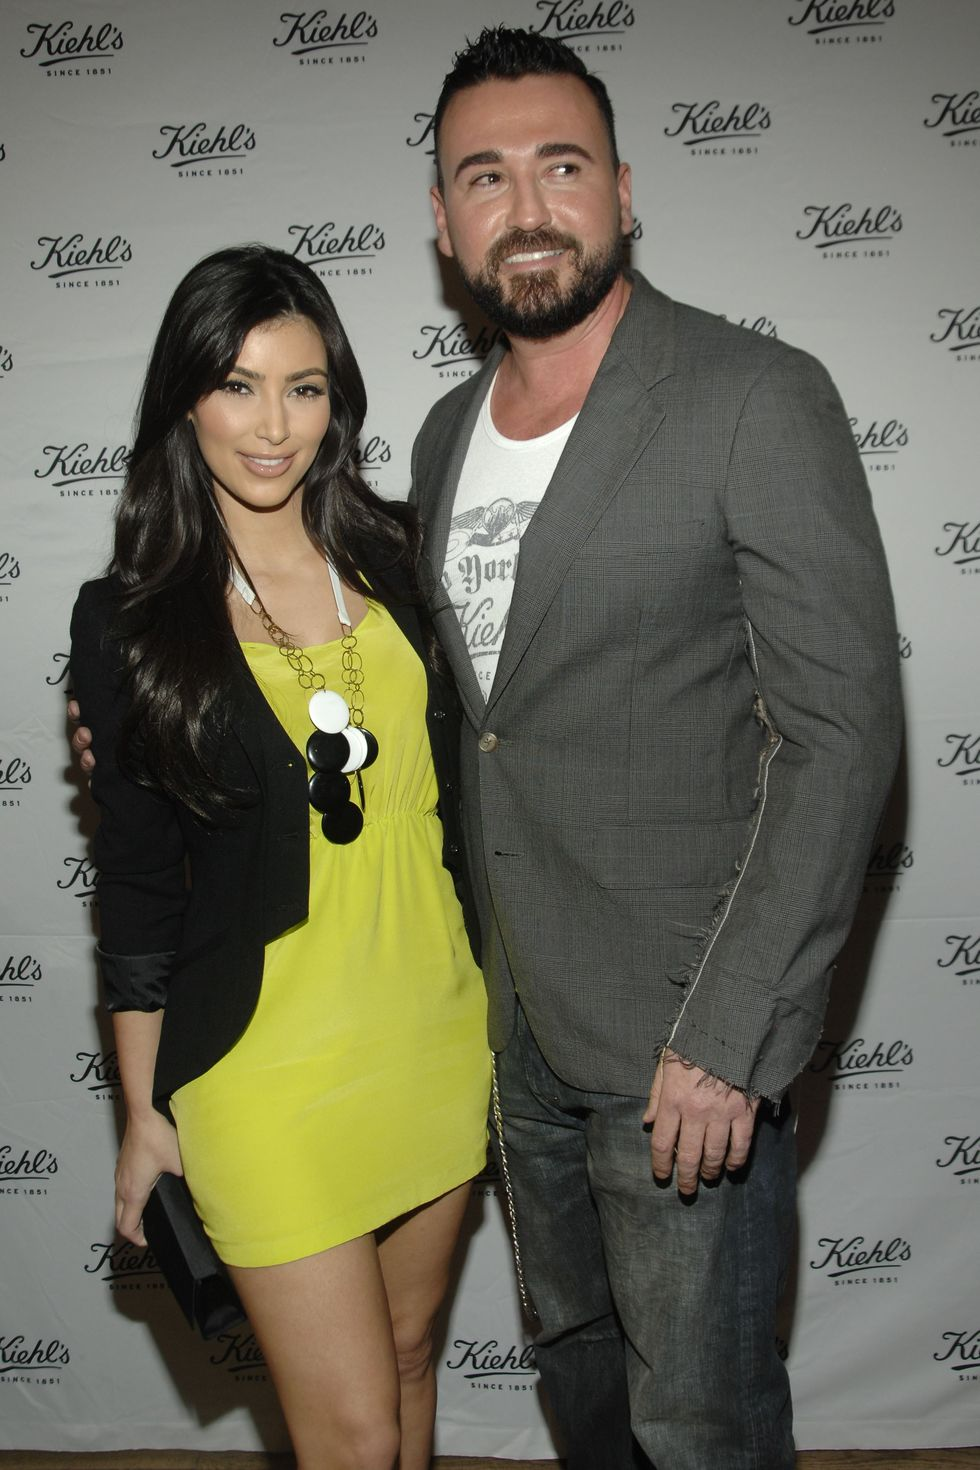 kim-kardashian-at-kiehls-flagship-store-in-new-york-01